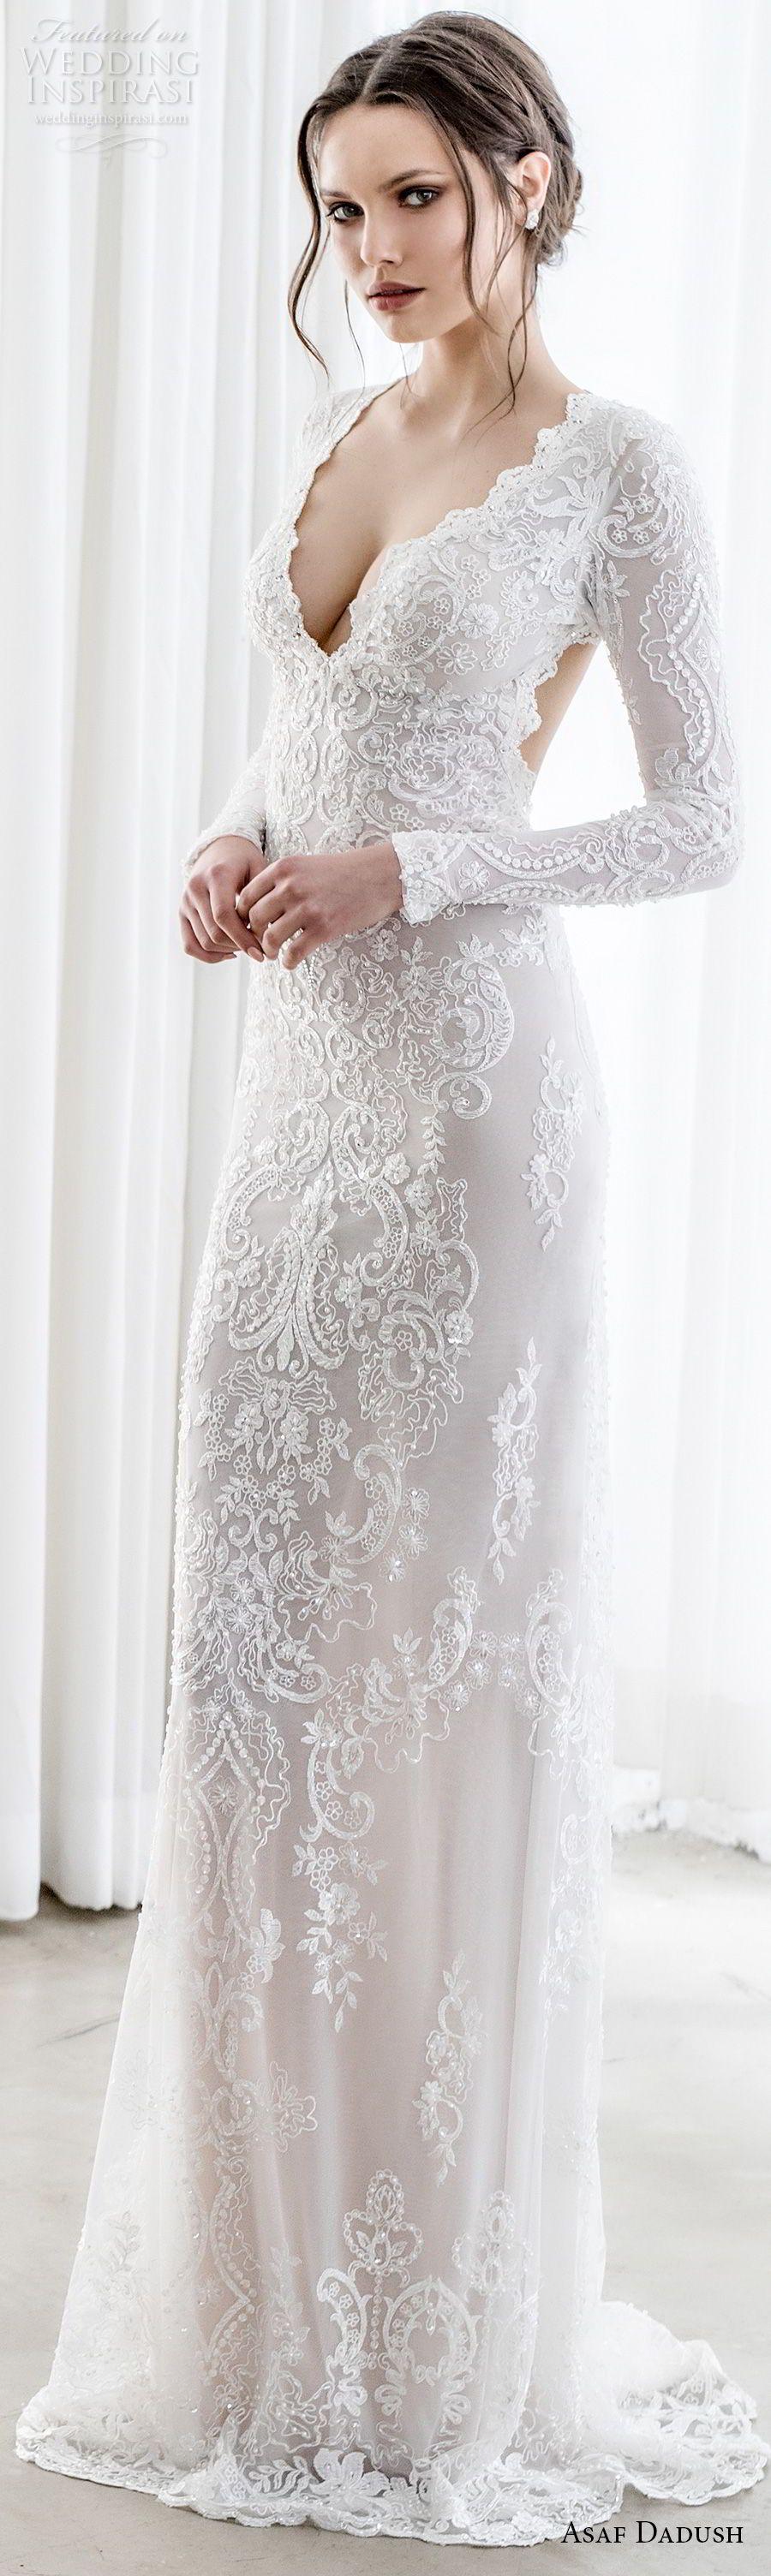 Asaf dadush wedding dresses neckline wedding dress and elegant